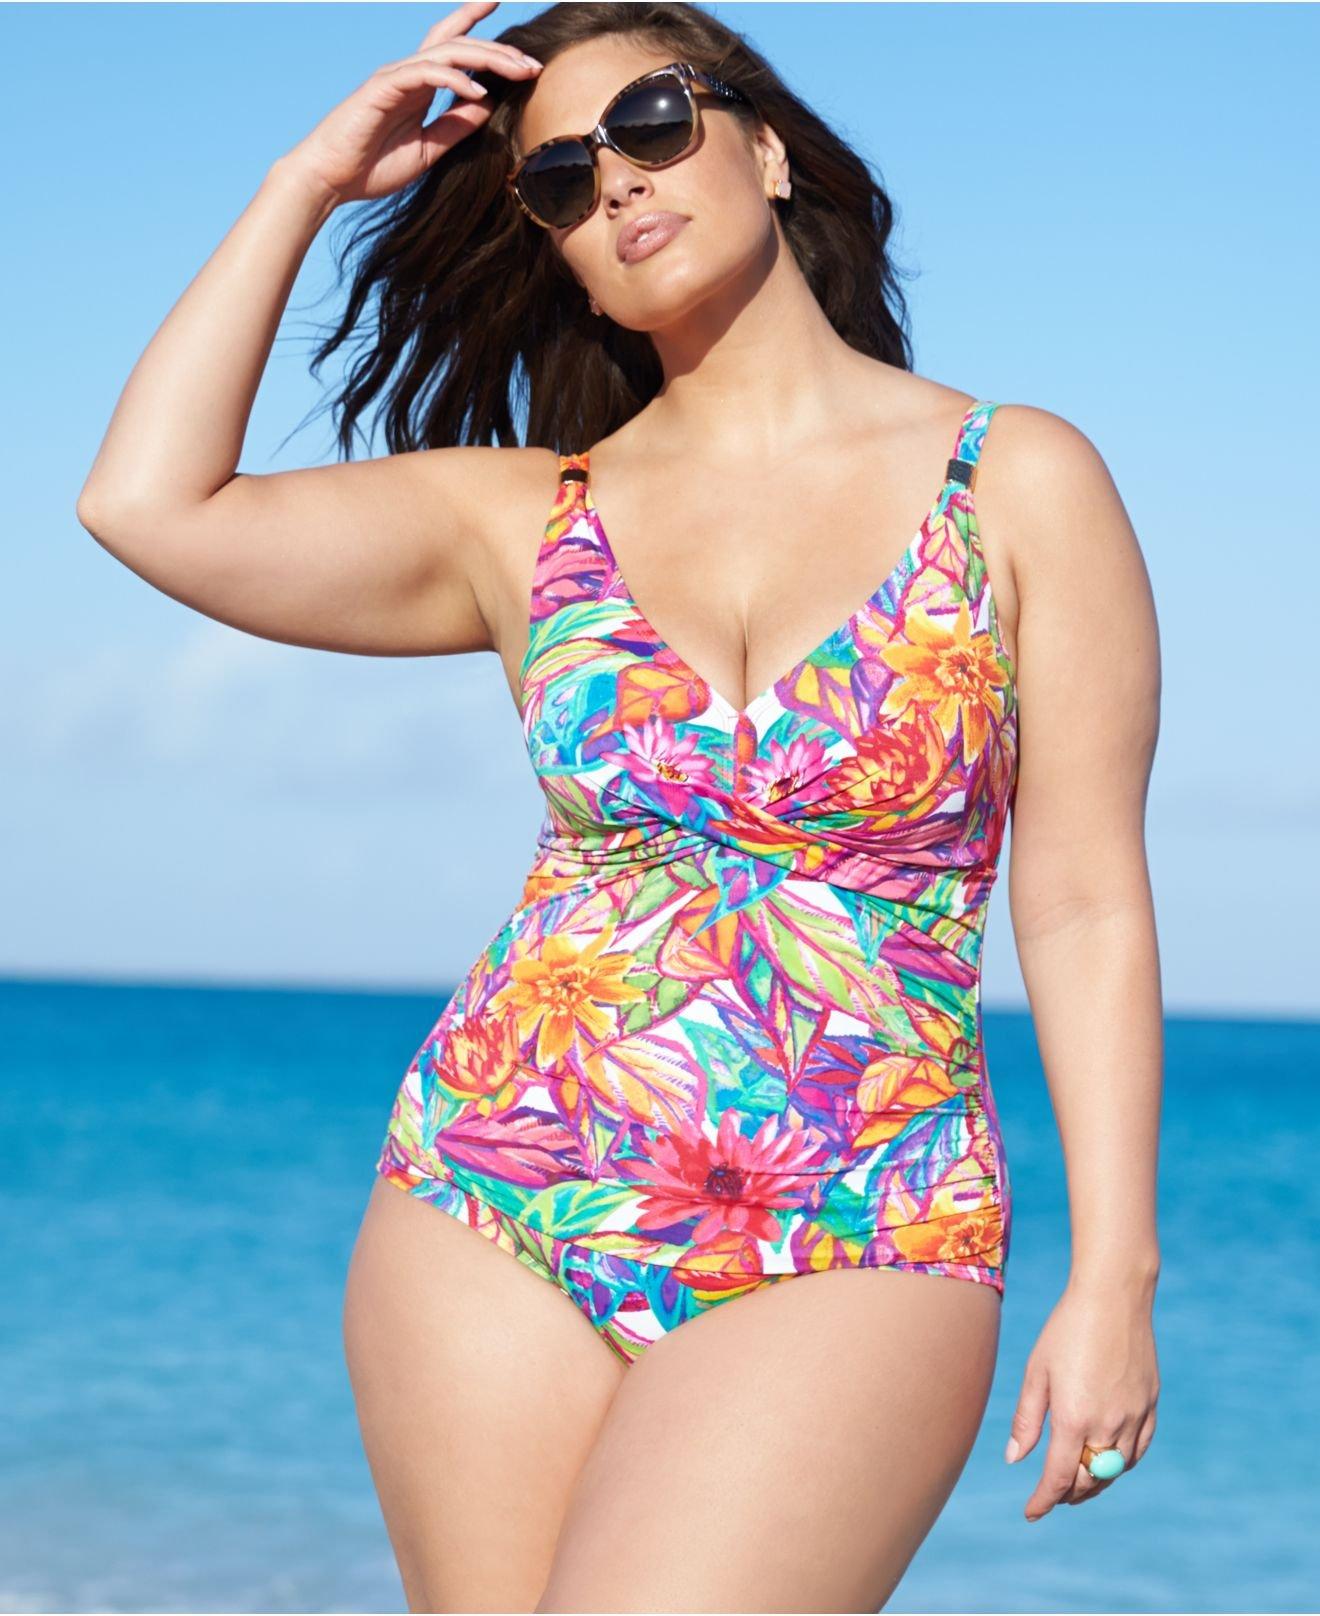 bdd4340da1d Lyst - Lauren by Ralph Lauren Plus Size Printed One-Piece Swimsuit